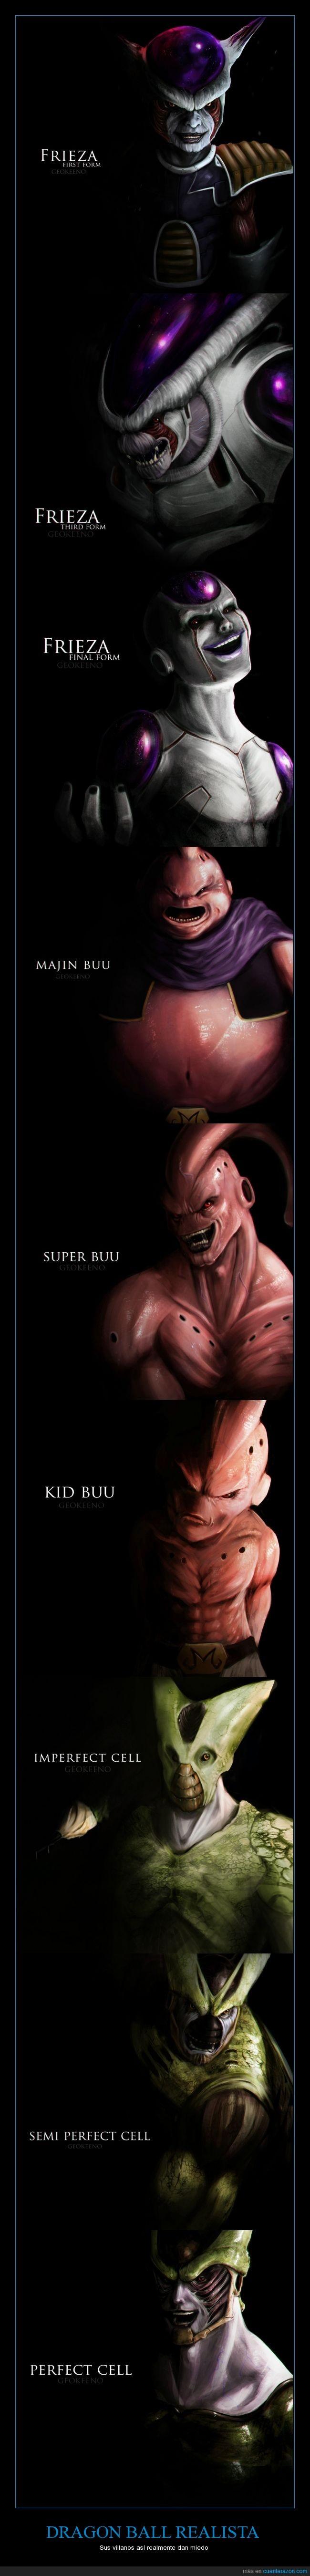 Buu,Cell,Célula,DBZ,Dragon Ball,forma,Freezer,Frieza,geokeeno,ilustración,realista,villano